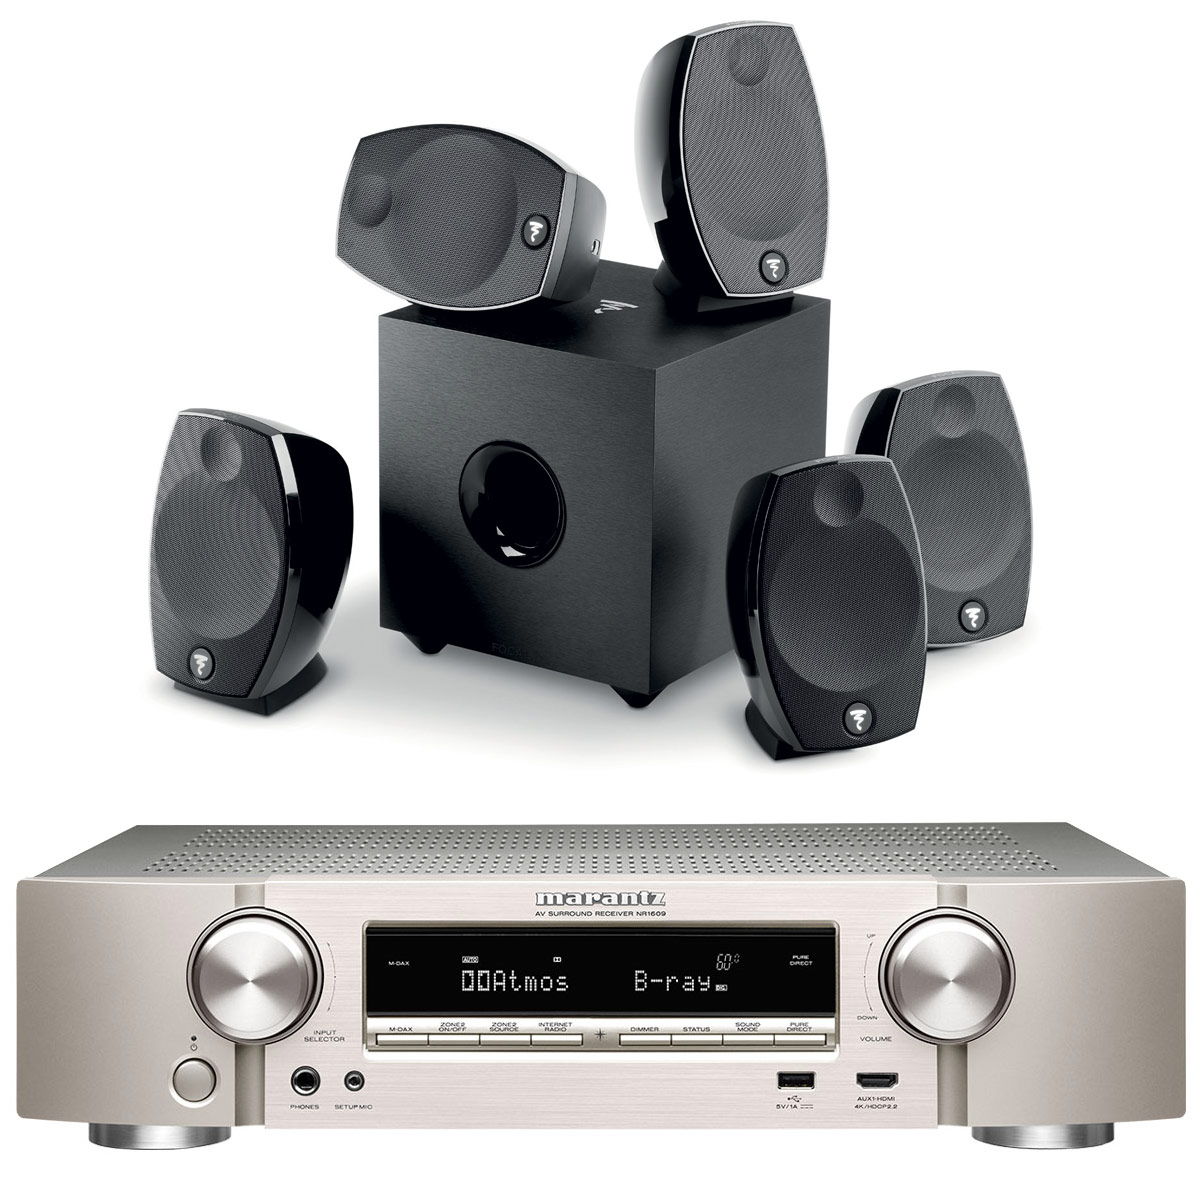 Ensemble home cinéma Marantz NR1609 Argent/Or + Focal Sib Evo 5.1 Ampli-tuner Home Cinema Slim 3D Ready 5.2 - Dolby Atmos / DTS:X - 8x HDMI 4K UHD, HDCP 2.2, HDR - Multiroom - Wi-Fi/Bluetooth/AirPlay 2 - Amazon Alexa + Pack d'enceintes 5.1